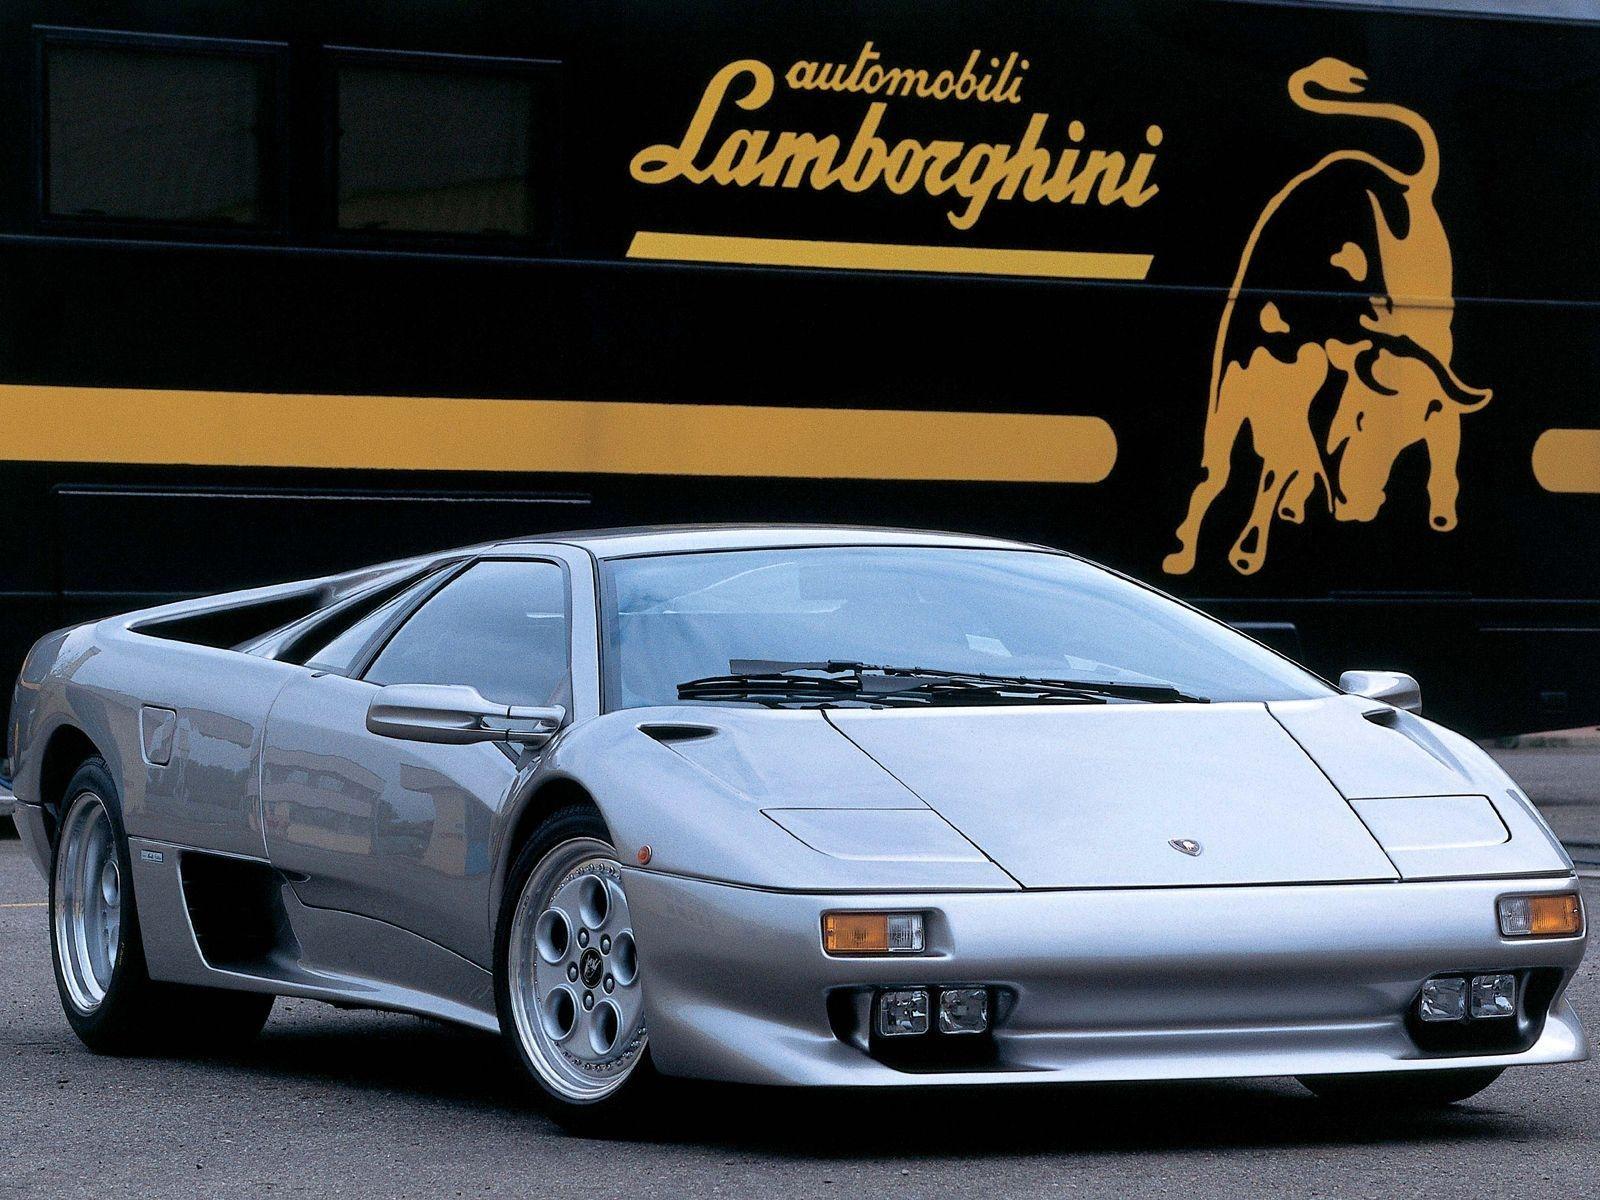 Ordinaire Lamborghini 1999 | LAMBORGHINI U0026 PORSCHE | Pinterest | Lamborghini Diablo,  Lamborghini And Cars